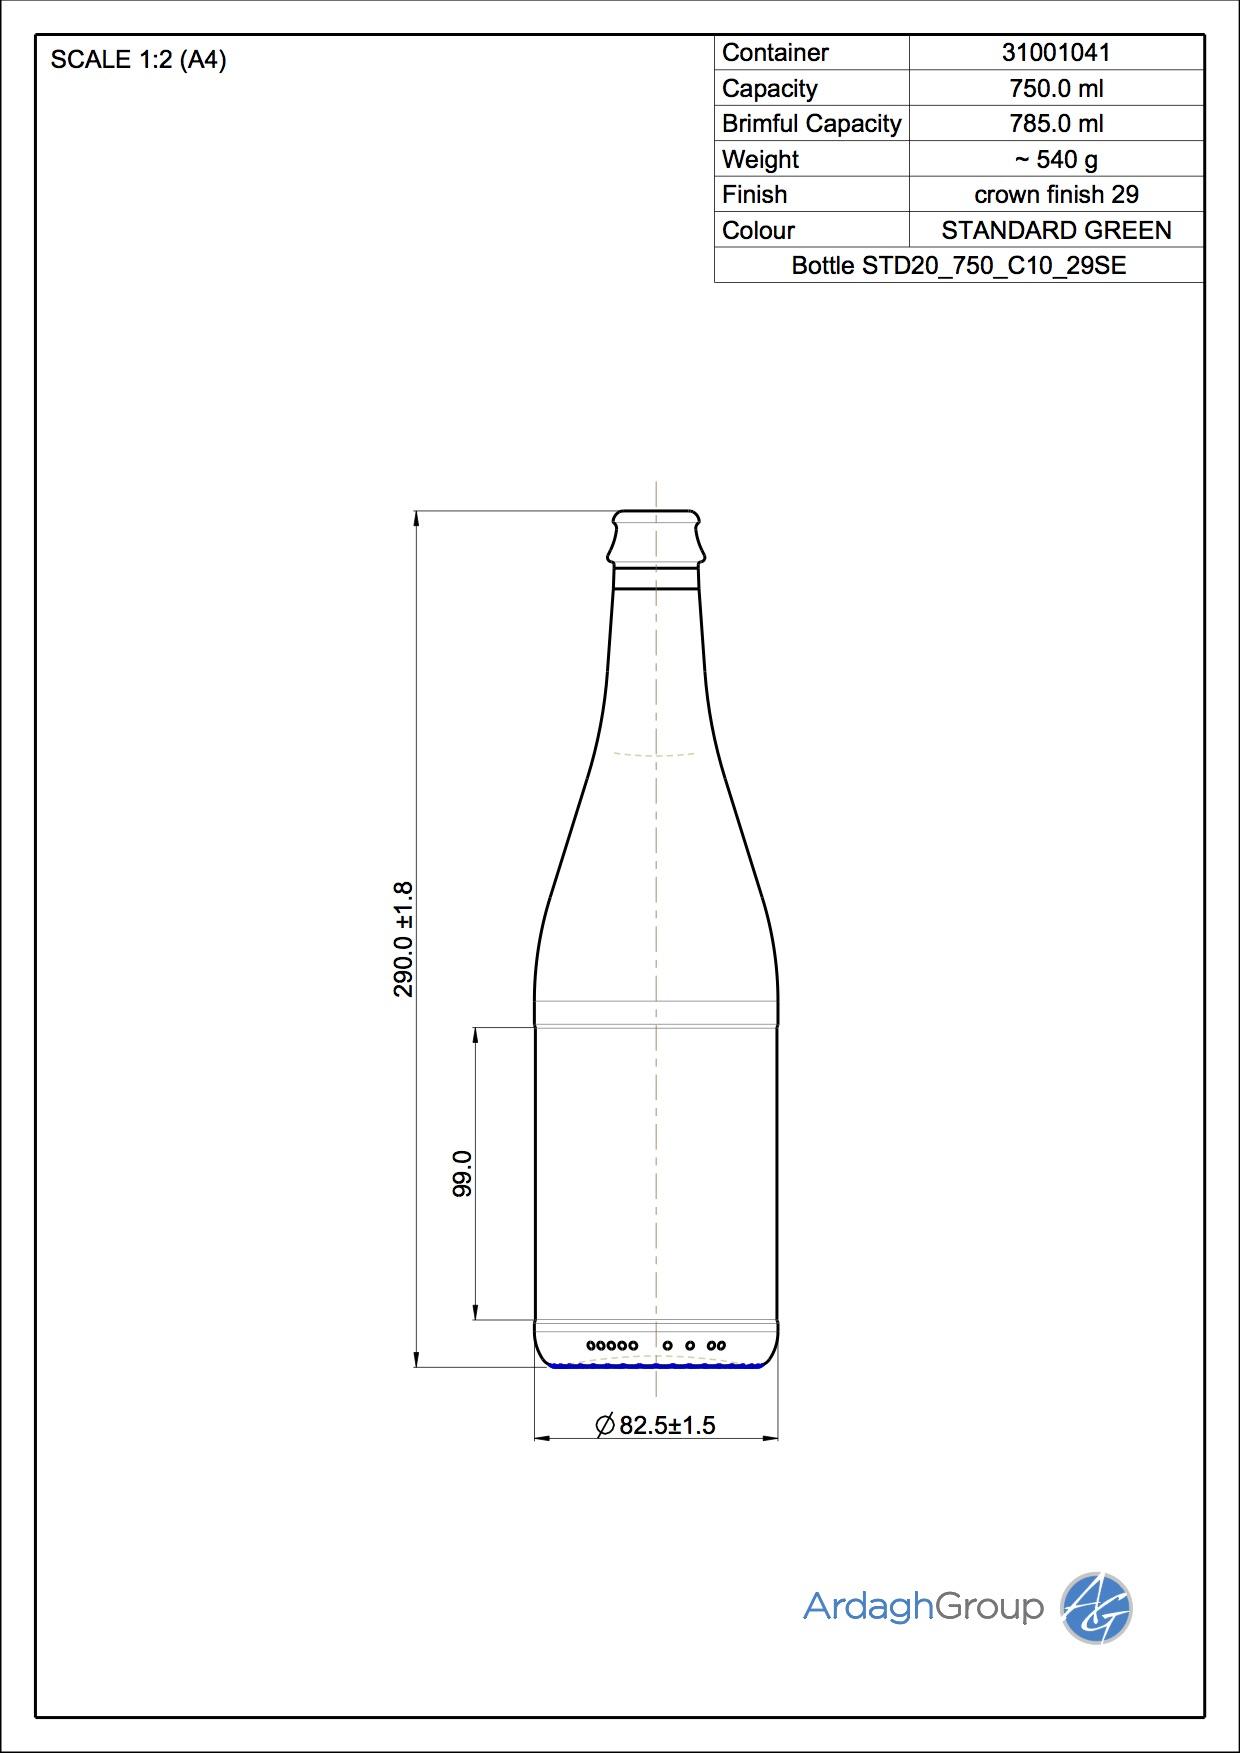 Bottle STD20 750 C10 29SE